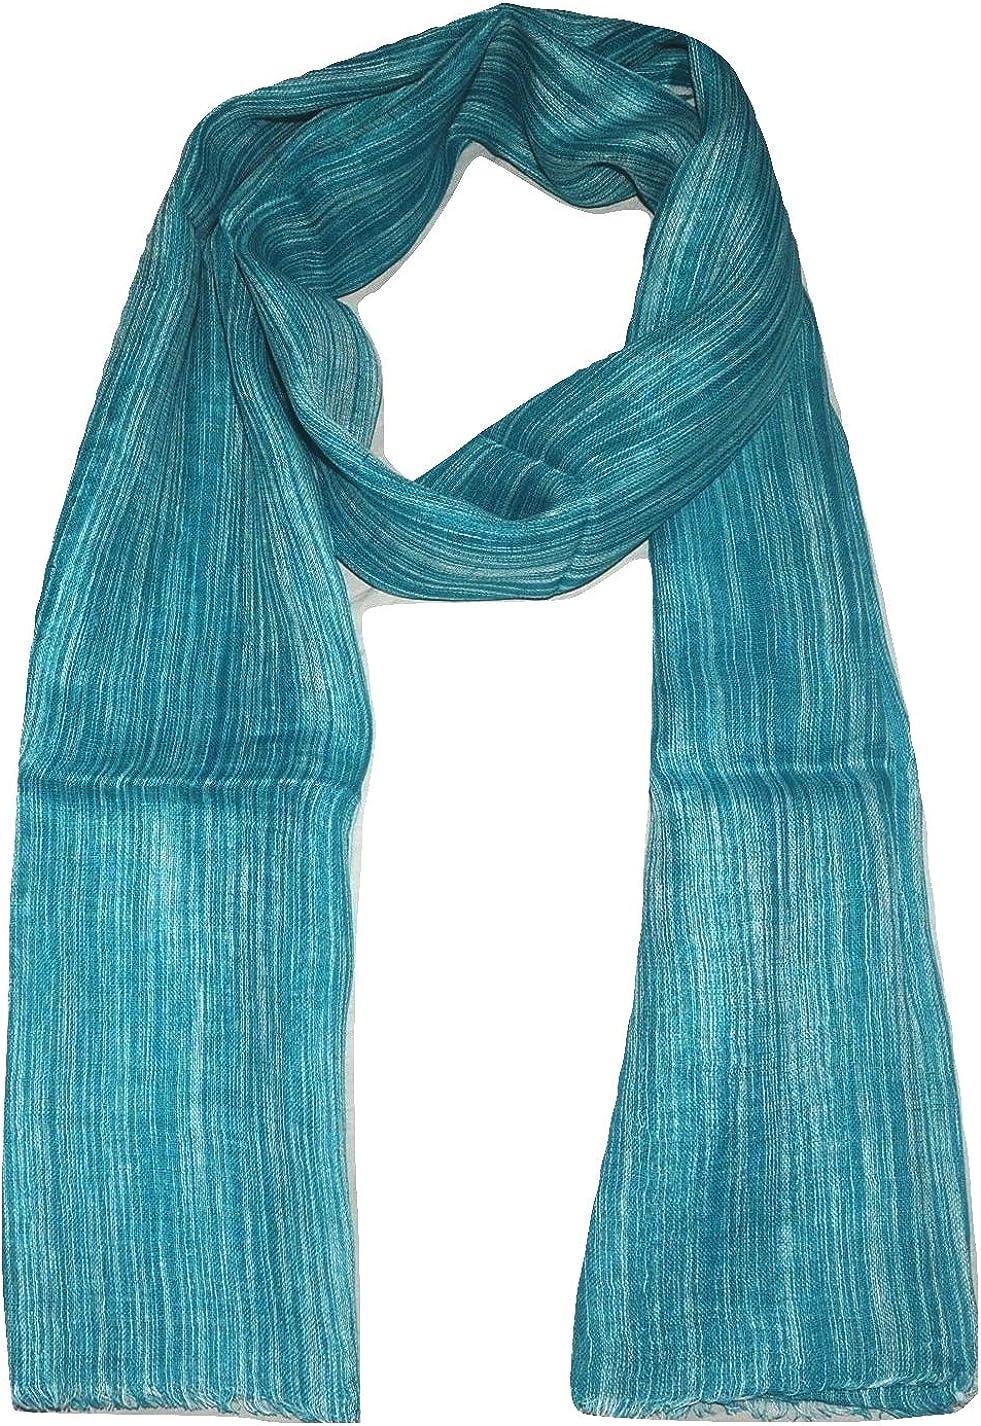 100% Pure Linen Scarf, IKAT Weave in Melange Stripes, Linen Scarf.